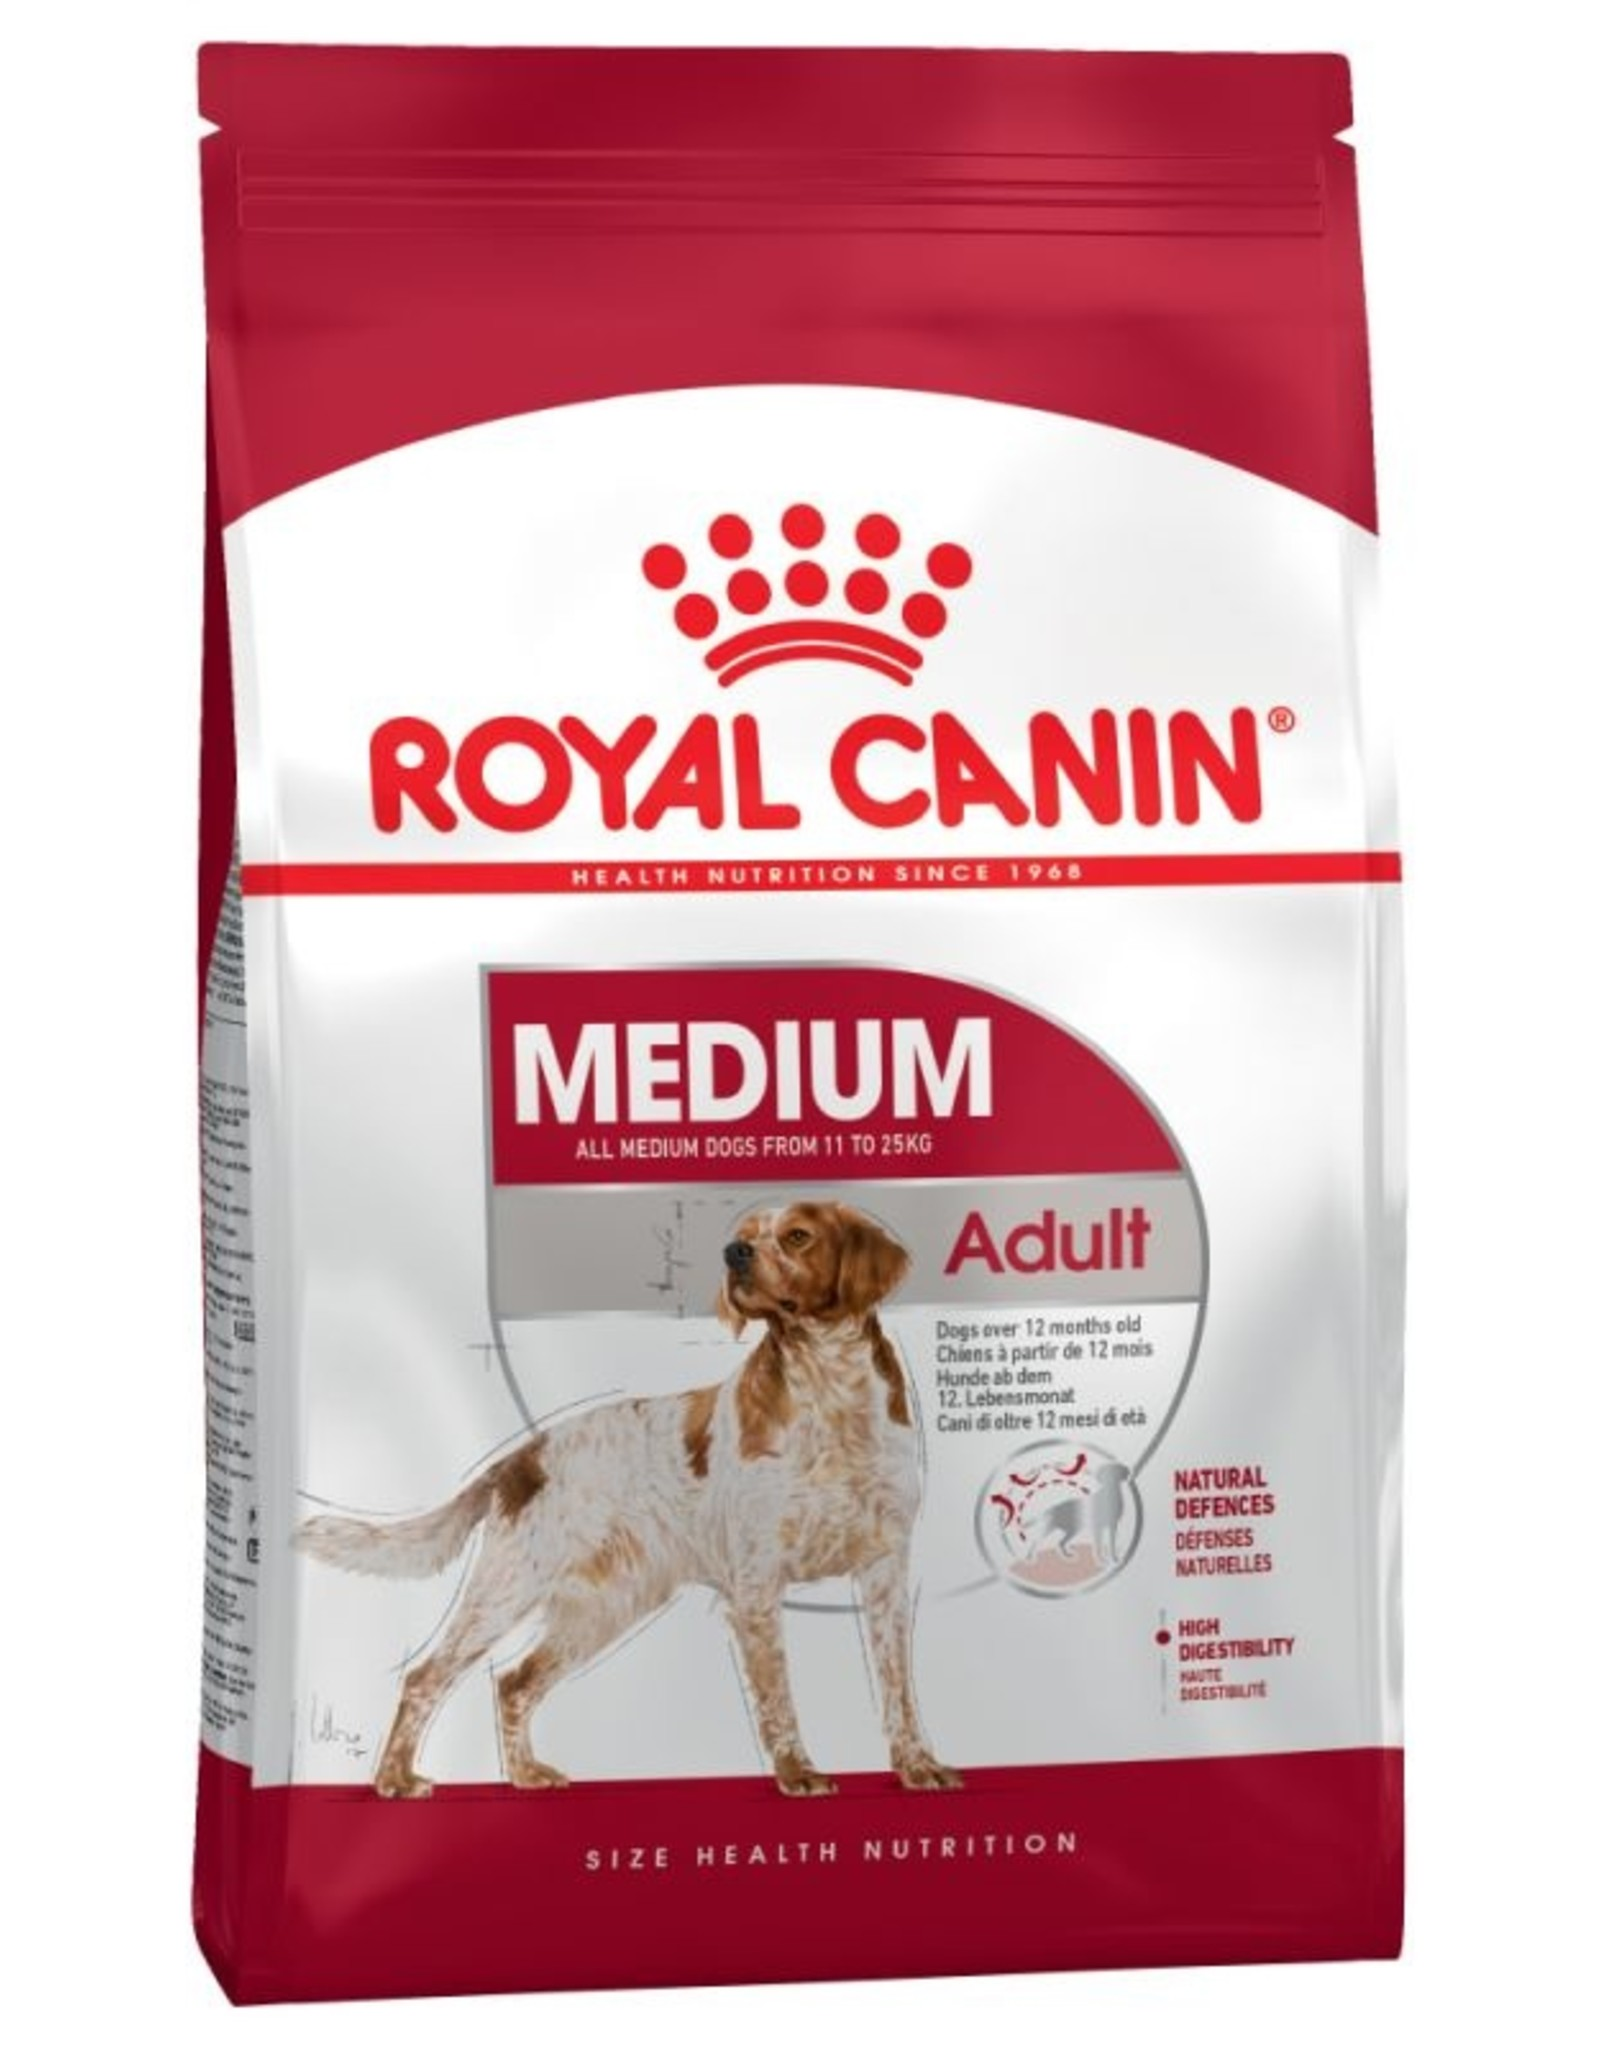 Royal Canin Royal Canin Shn Medium Adult Hond 15kg